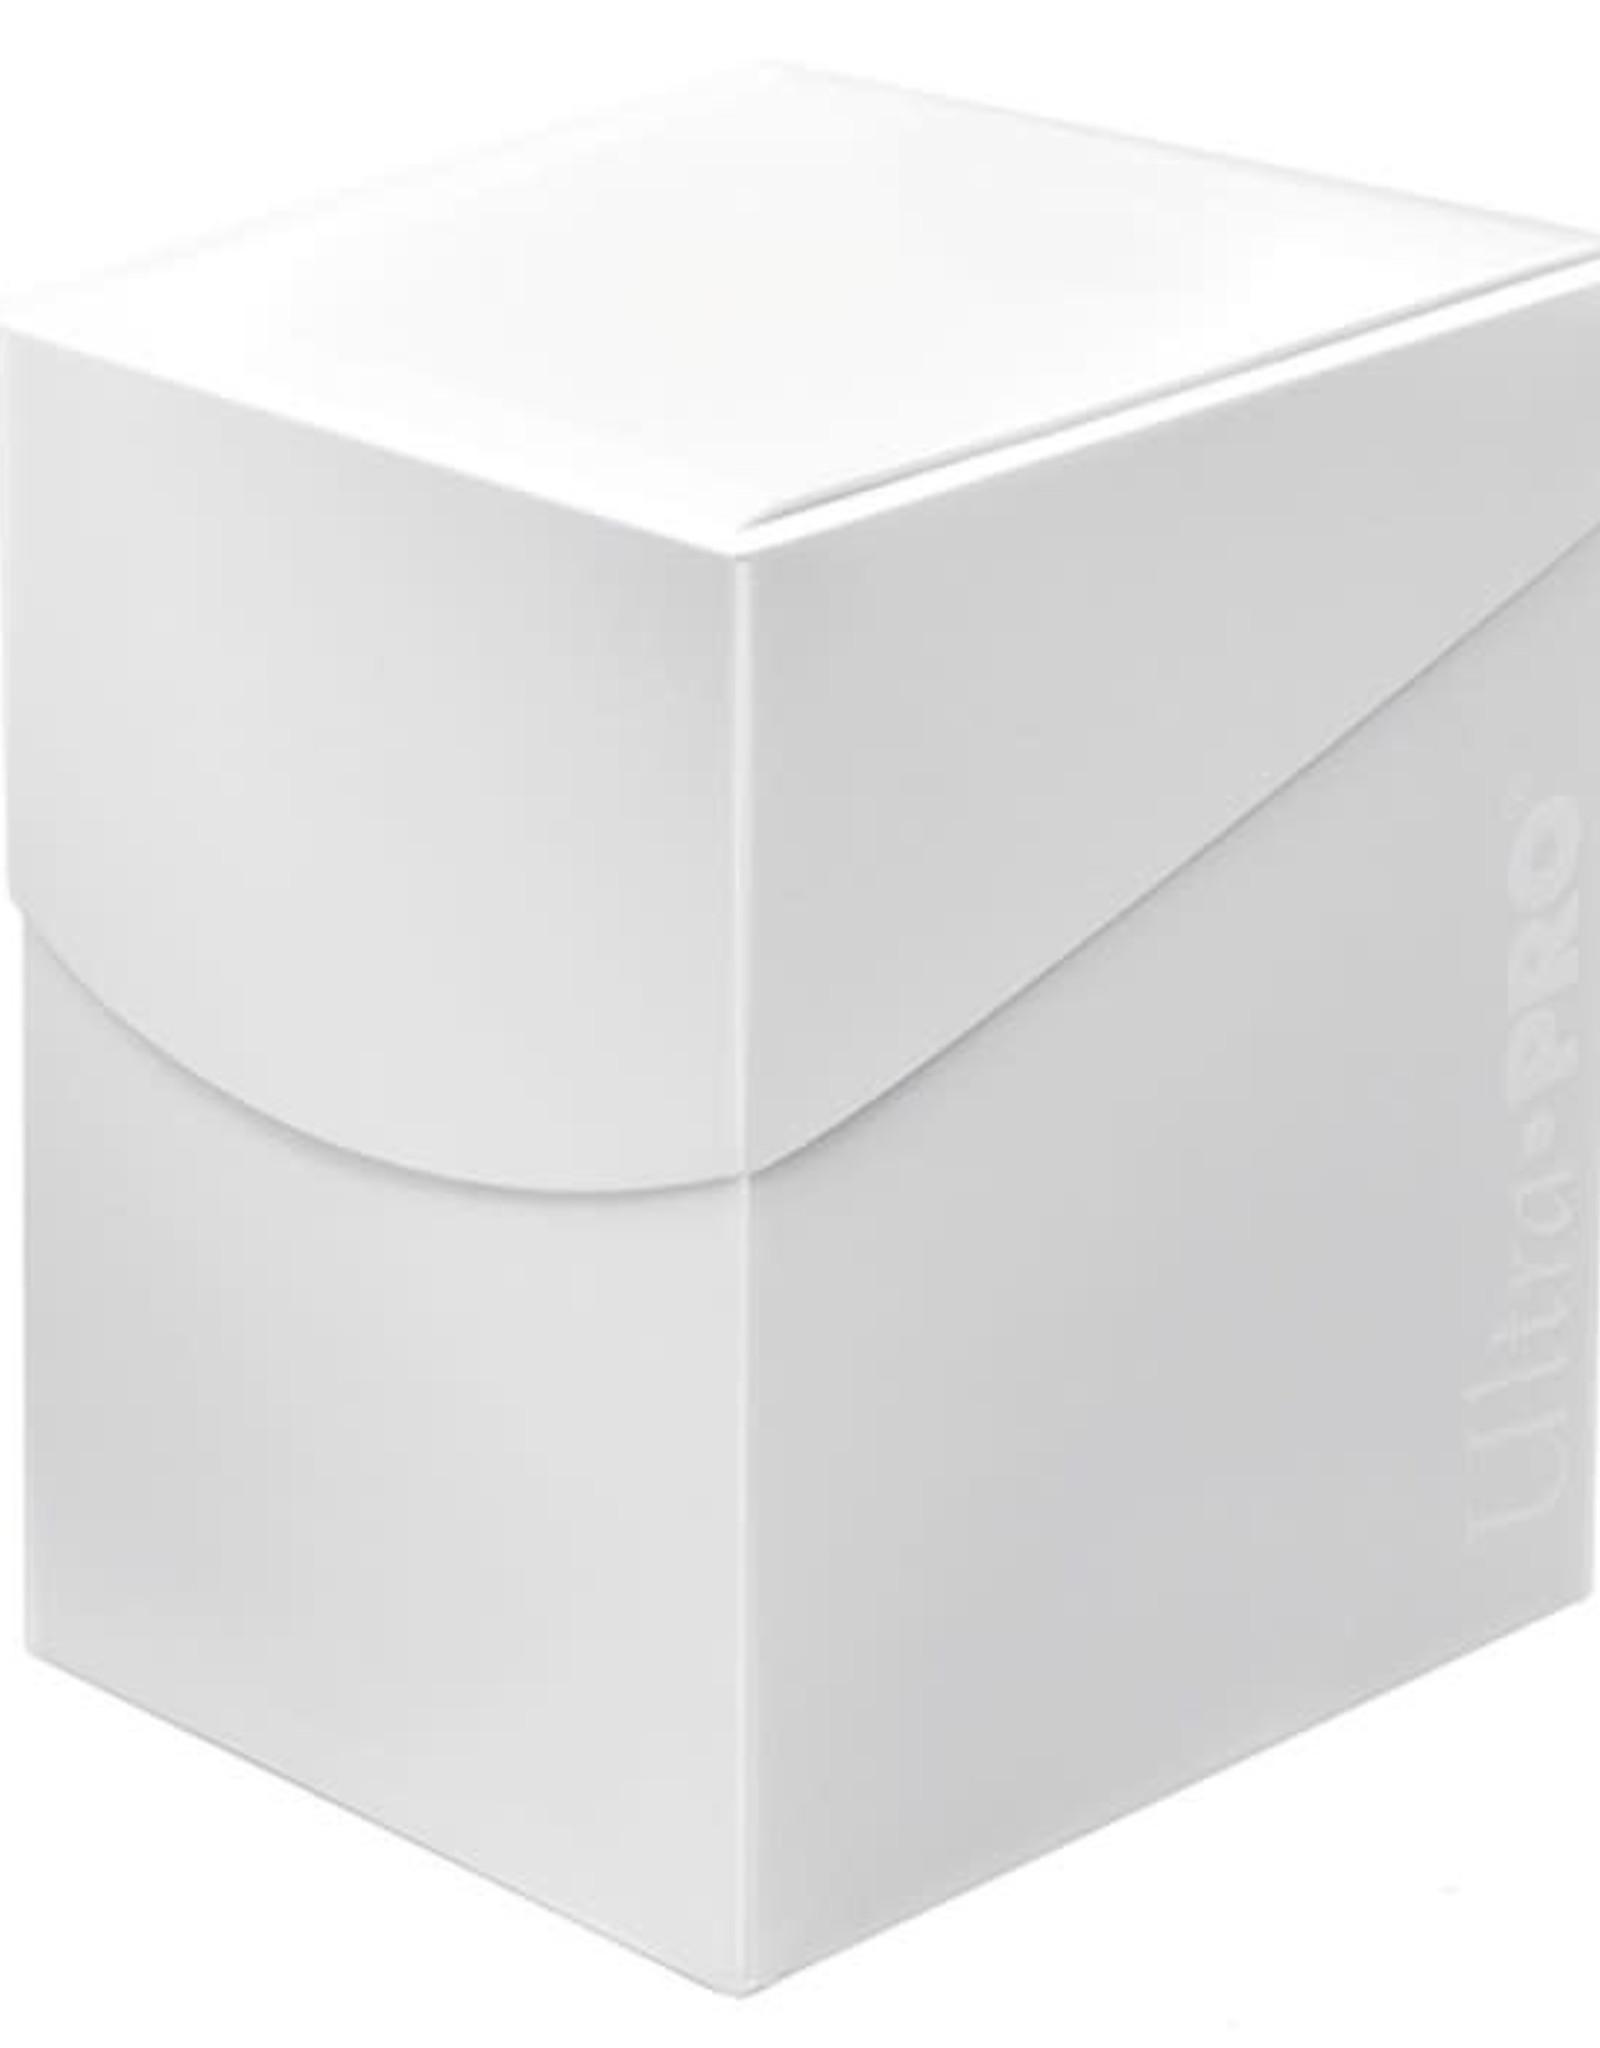 Ultra Pro Arctic White 100+ Pro Eclipse Deck Box